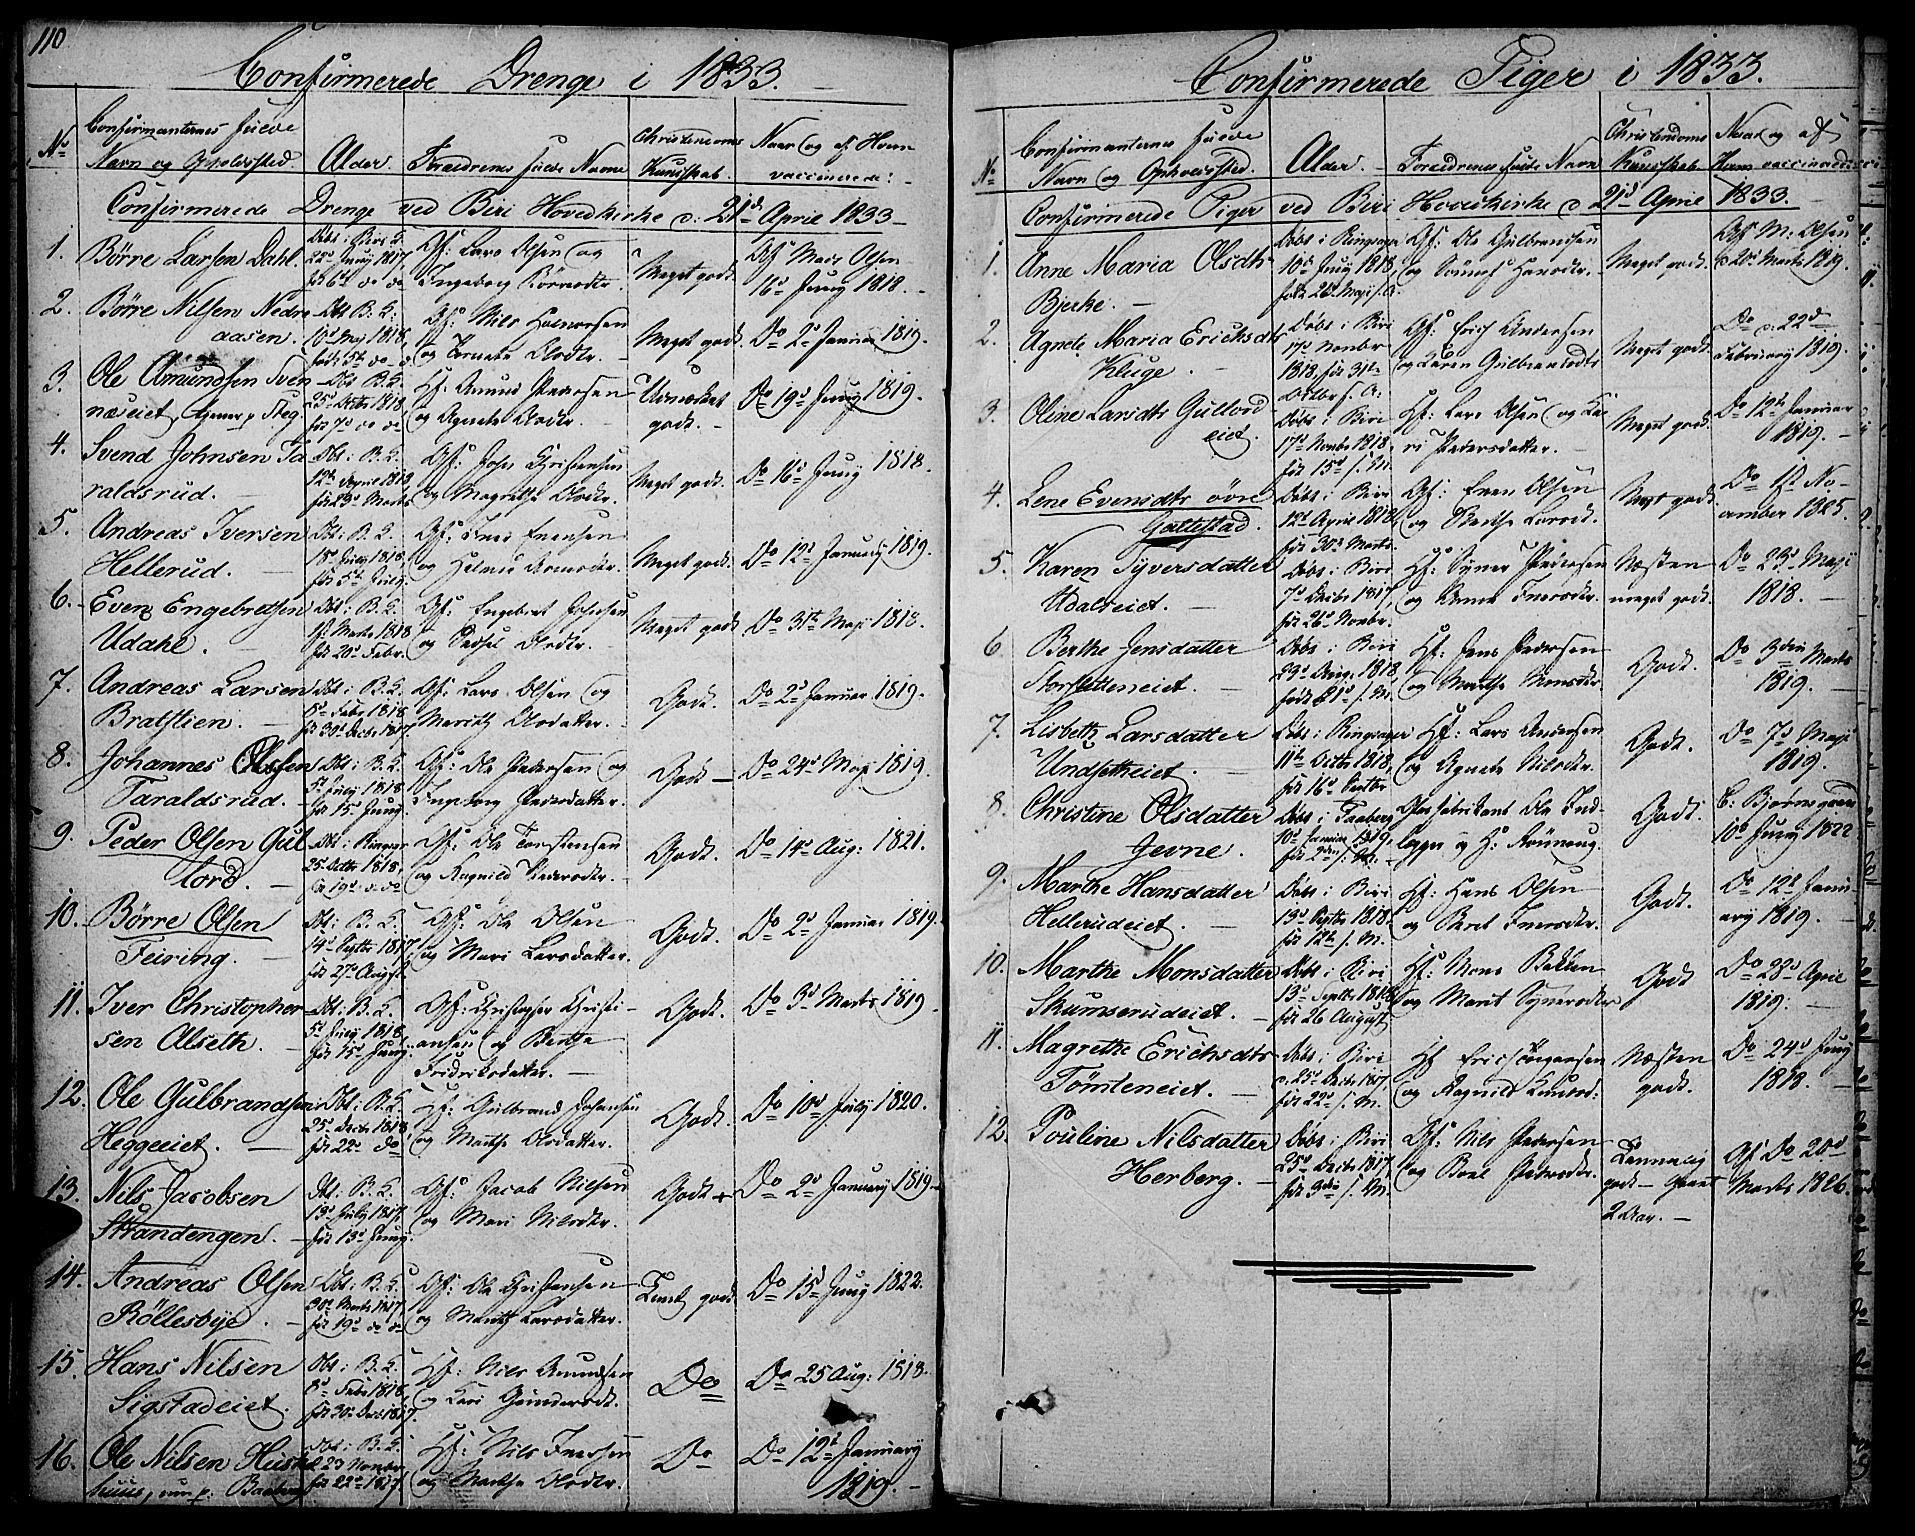 SAH, Biri prestekontor, Ministerialbok nr. 4, 1829-1842, s. 110